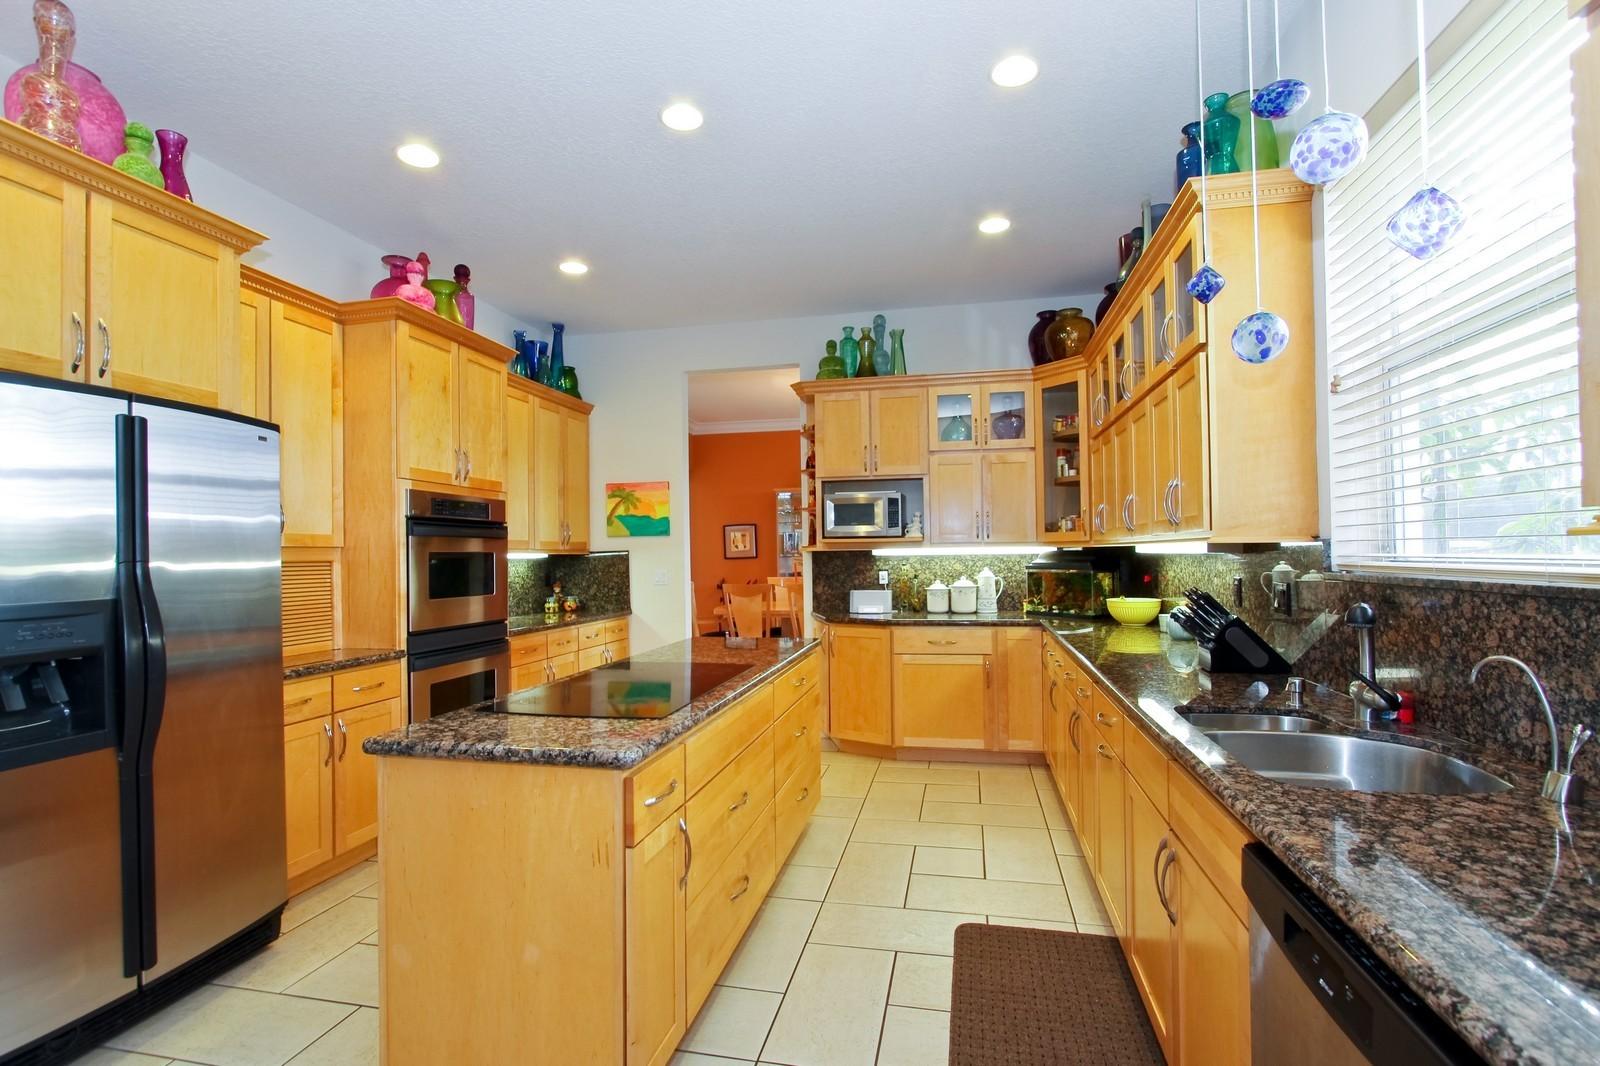 Real Estate Photography - 14542 Draft Horse Ln, Wellington, FL, 33414 - Kitchen